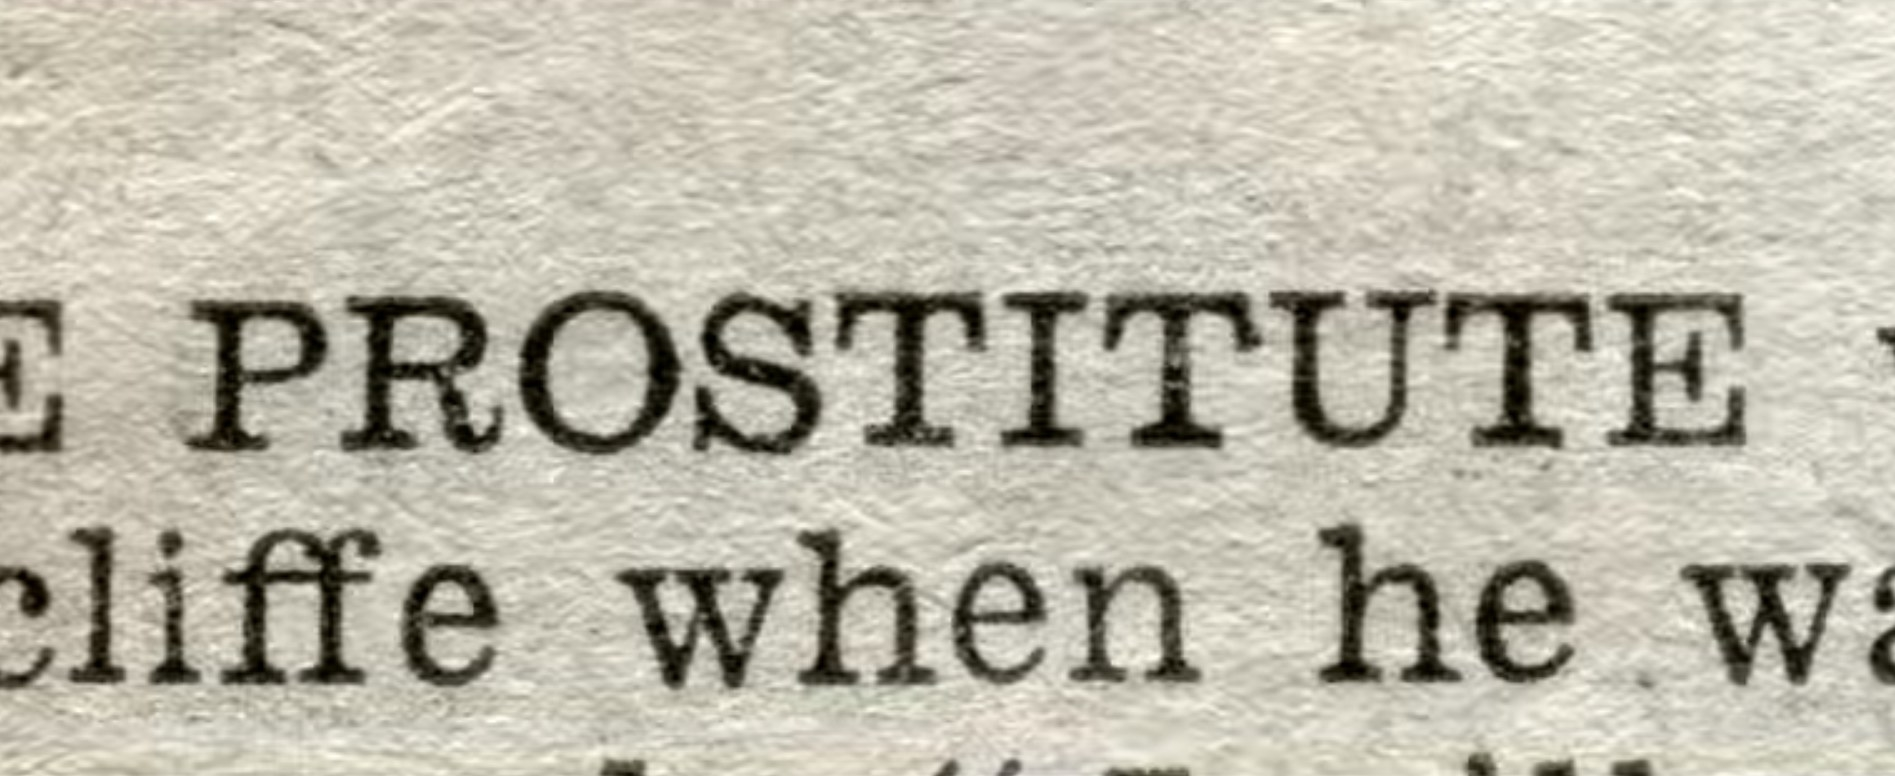 Newspaper citing attacks of prostitutes.